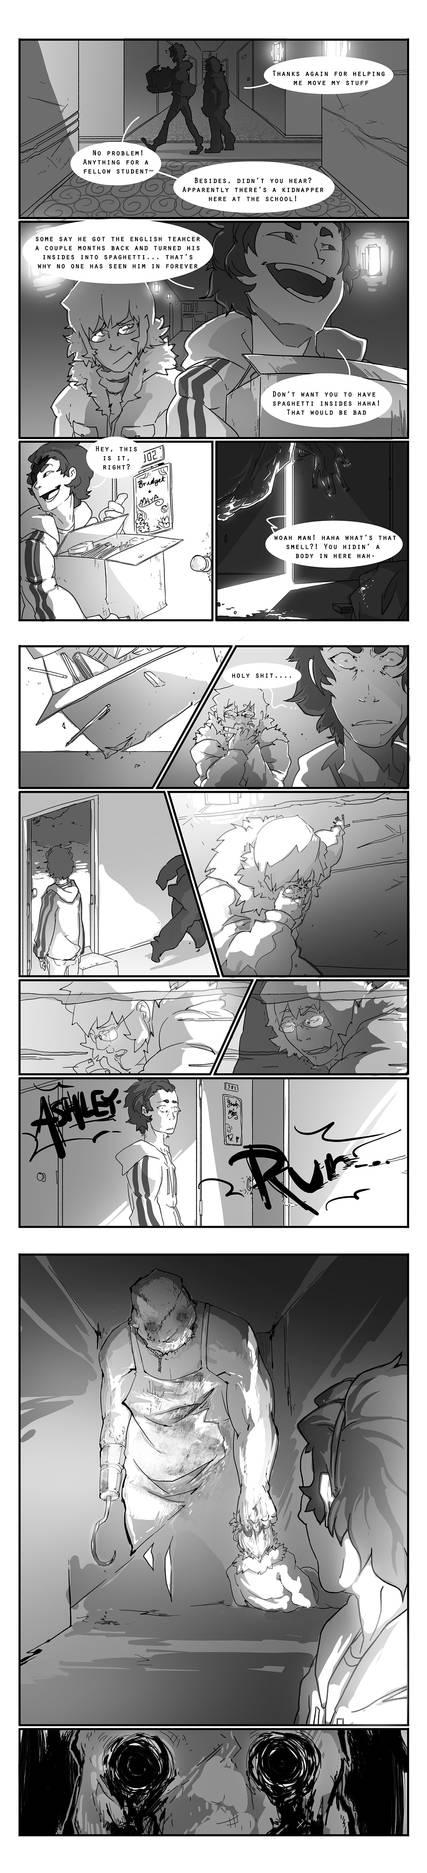 Night of the Hunter comic